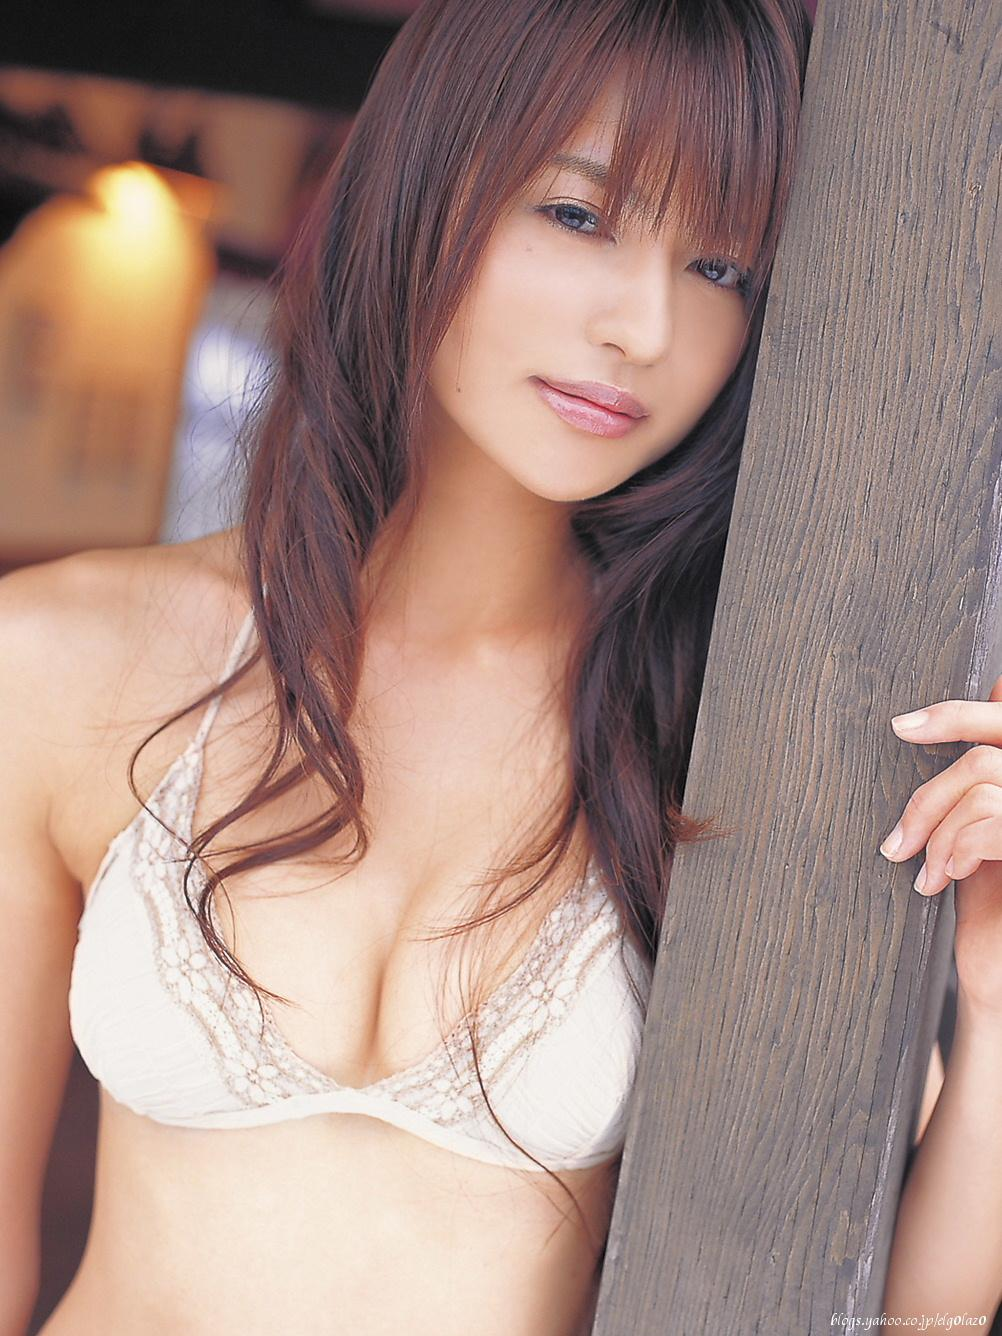 http://blog.cnobi.jp/v1/blog/user/a8c5c06266ed65ea9b67299e90592fa7/1307104735